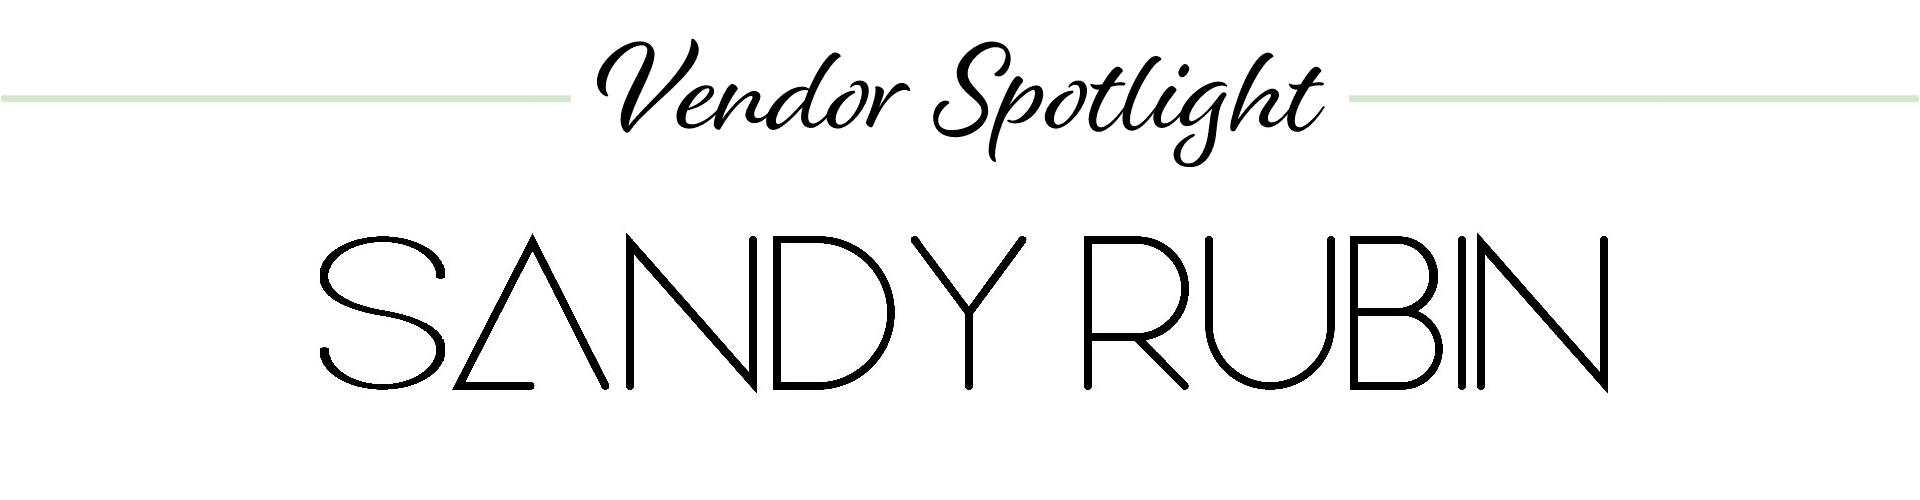 Sandy Rubin Jewelry logo